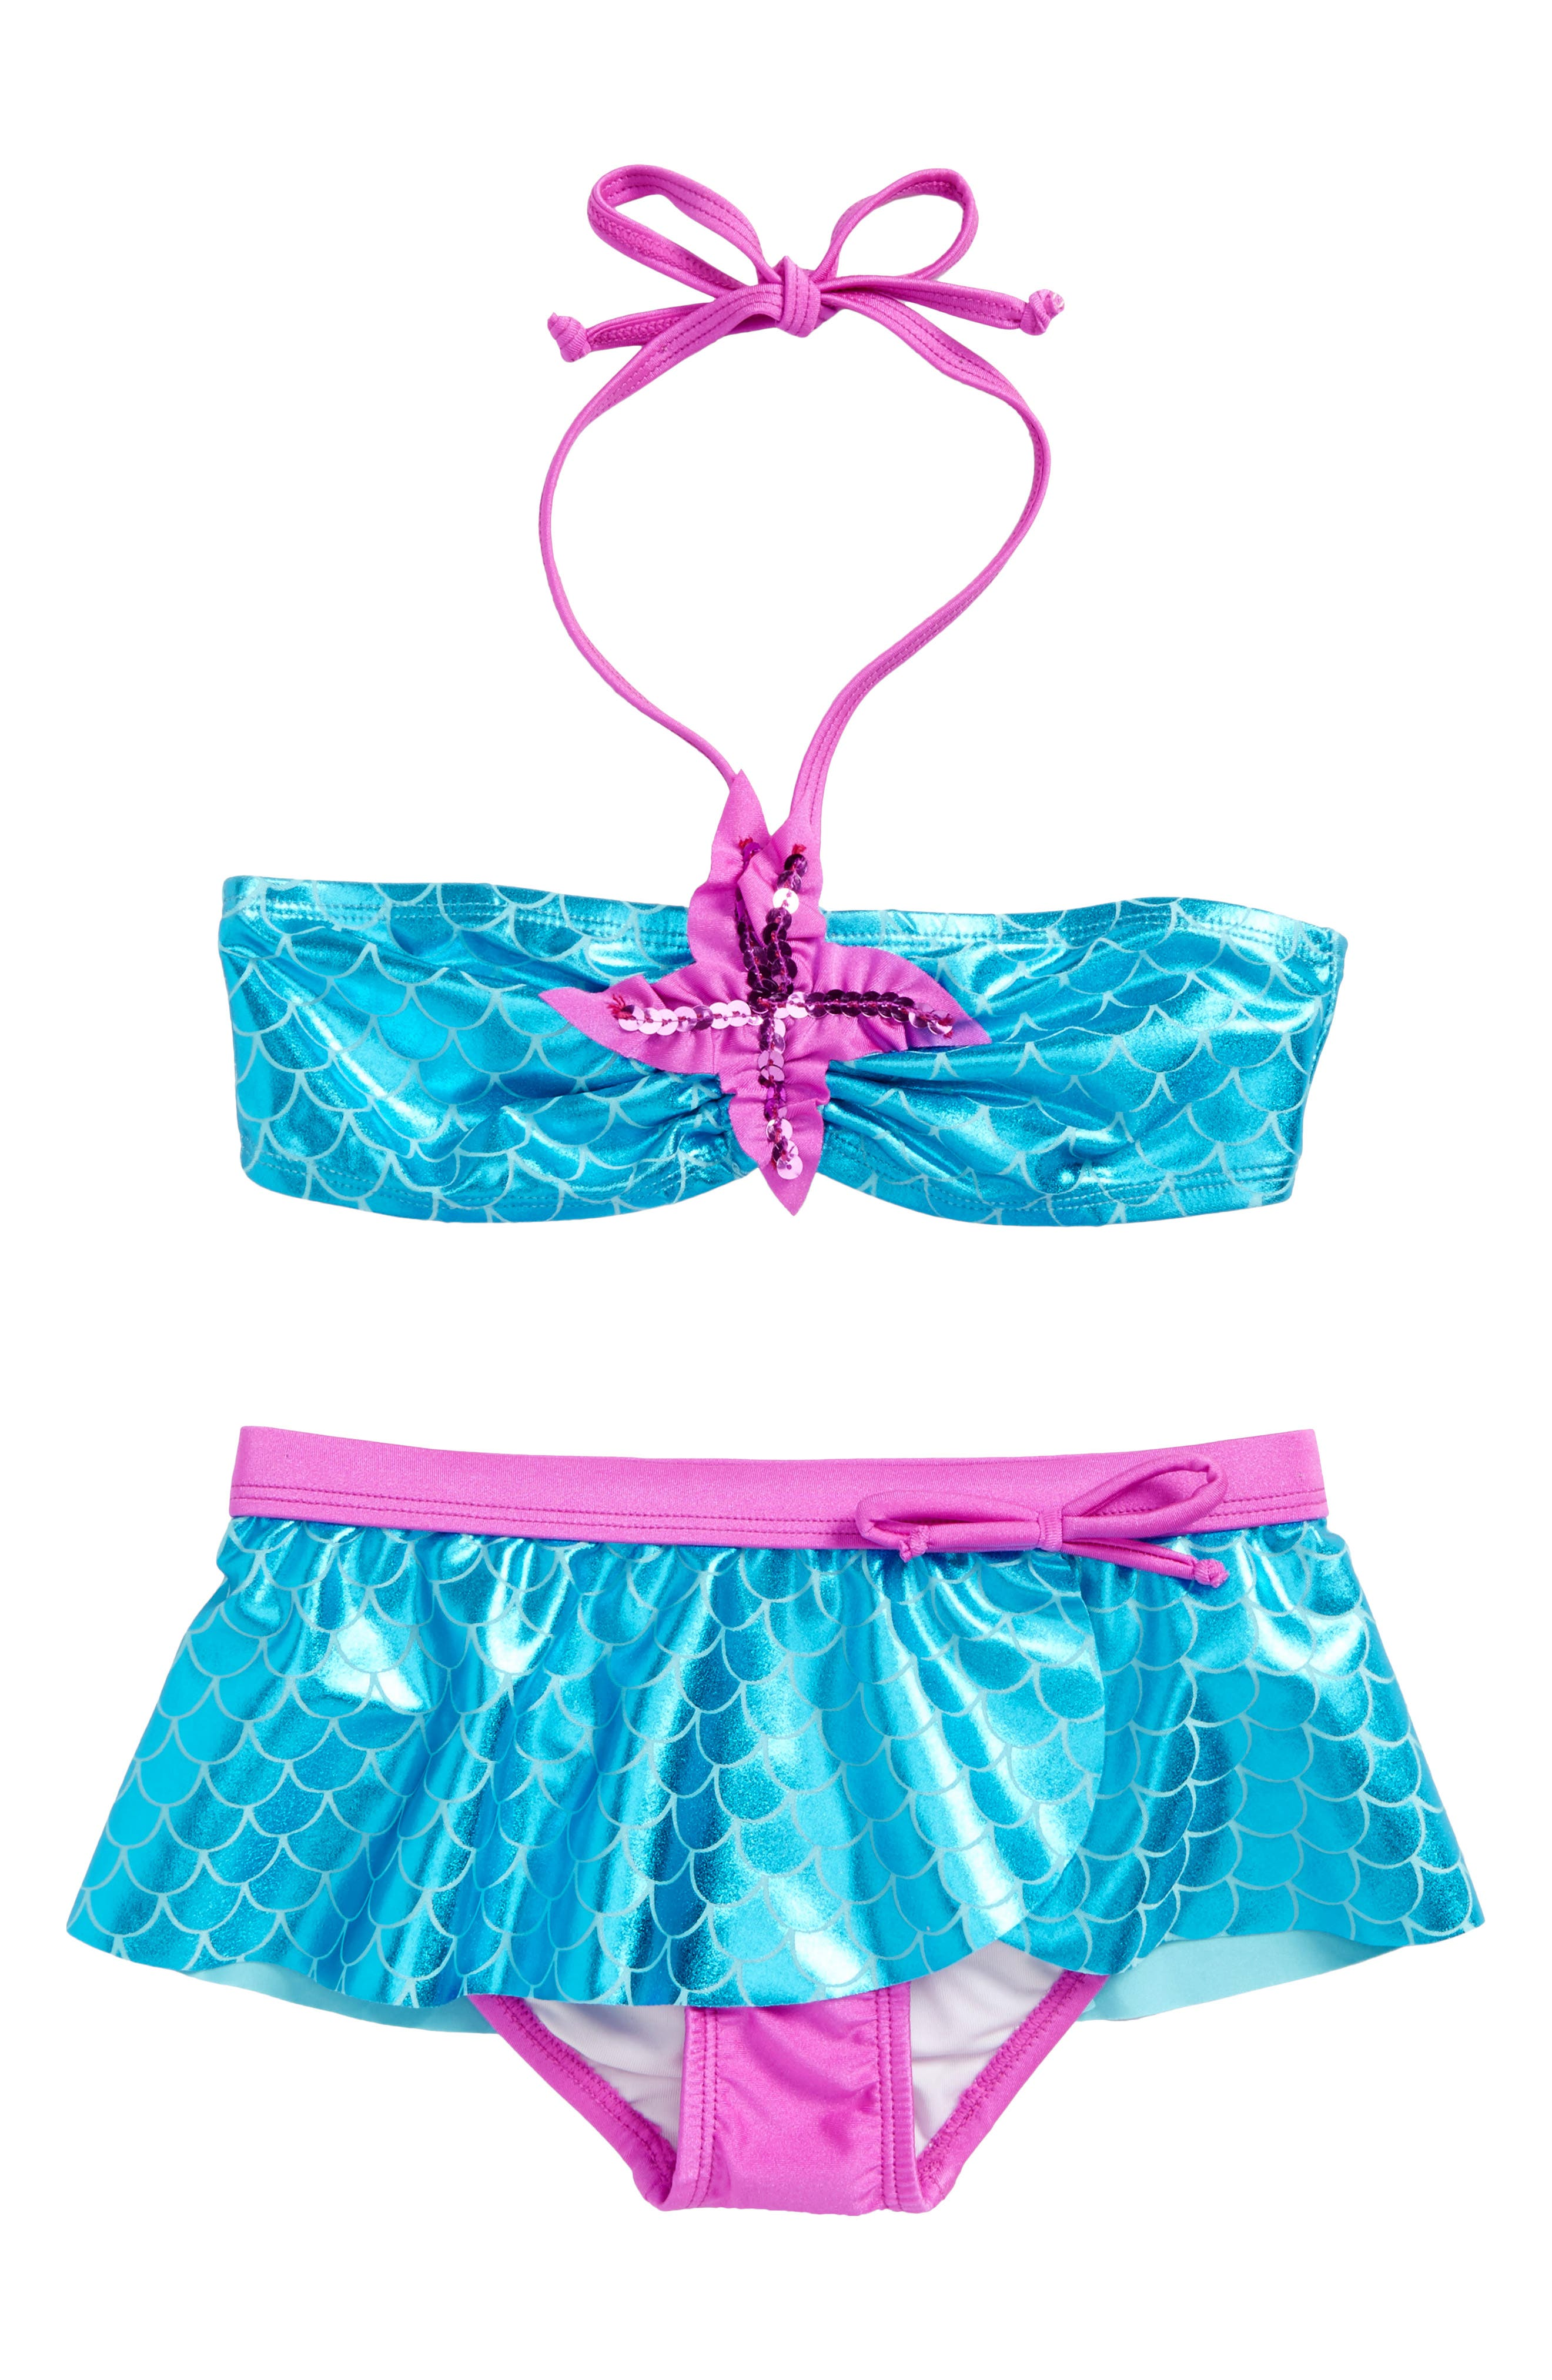 Alternate Image 1 Selected - Love U Lots Mermaid Two-Piece Bikini Swimsuit (Toddler Girls & Little Girls)